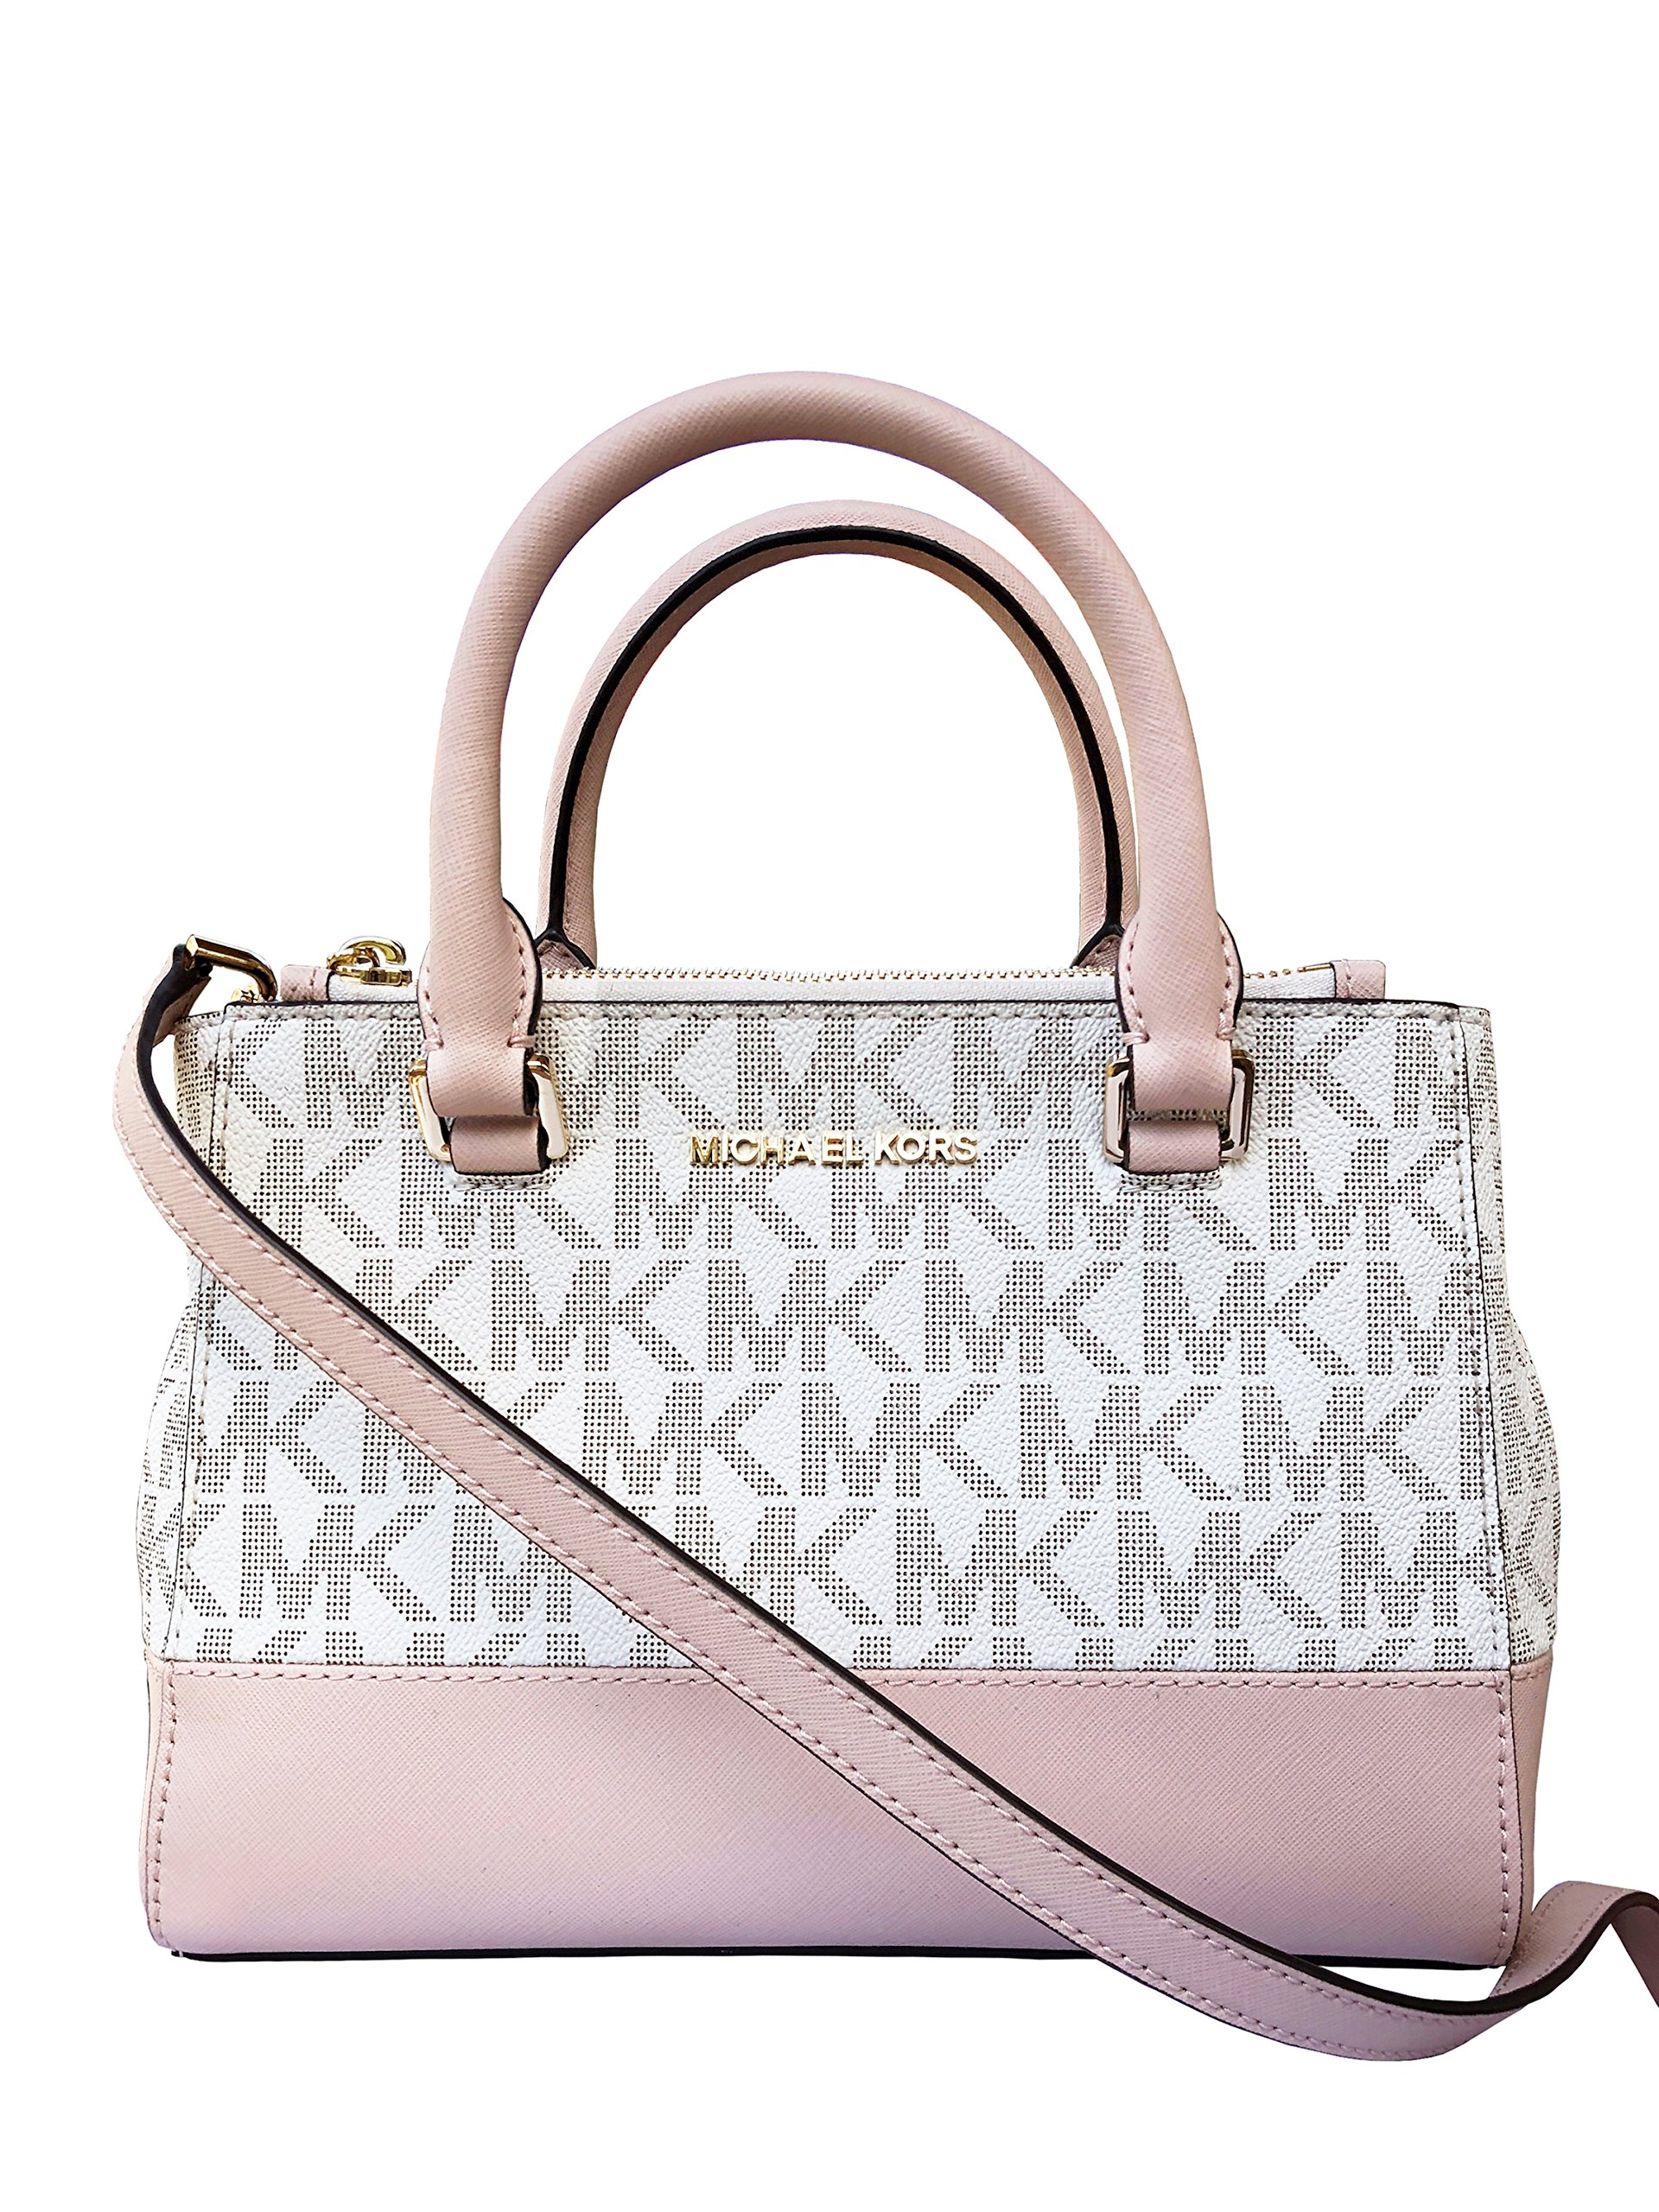 Michael Kors XS Kellen satchel vanilla ballet bag crossbody bag handbag by Michael Kors